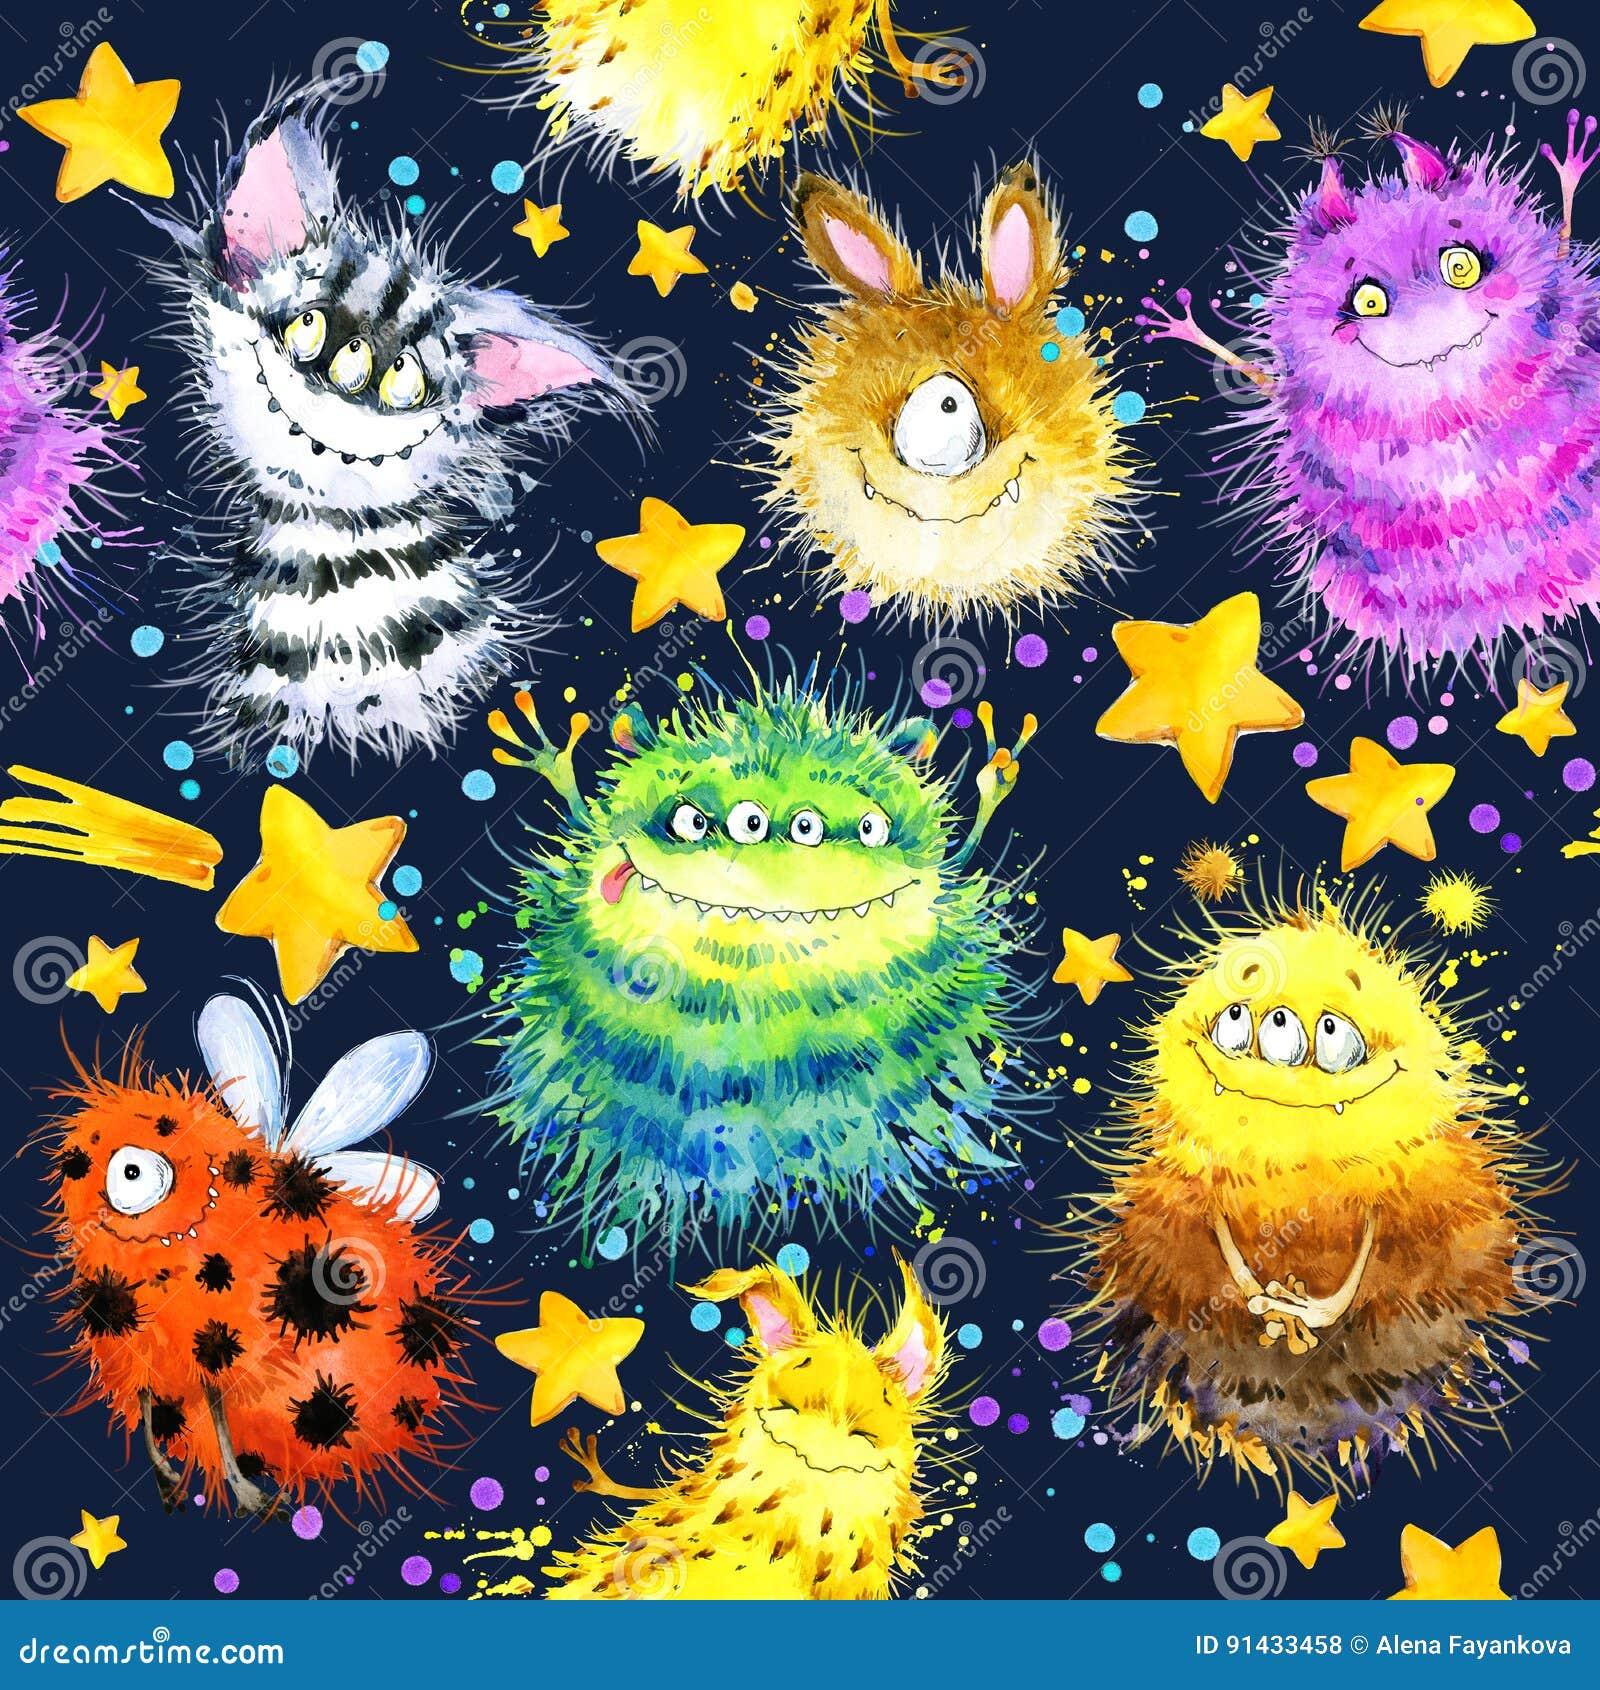 Cute monster seamless pattern. watercolor cartoon space illustration. rocket. Flying saucer. alien